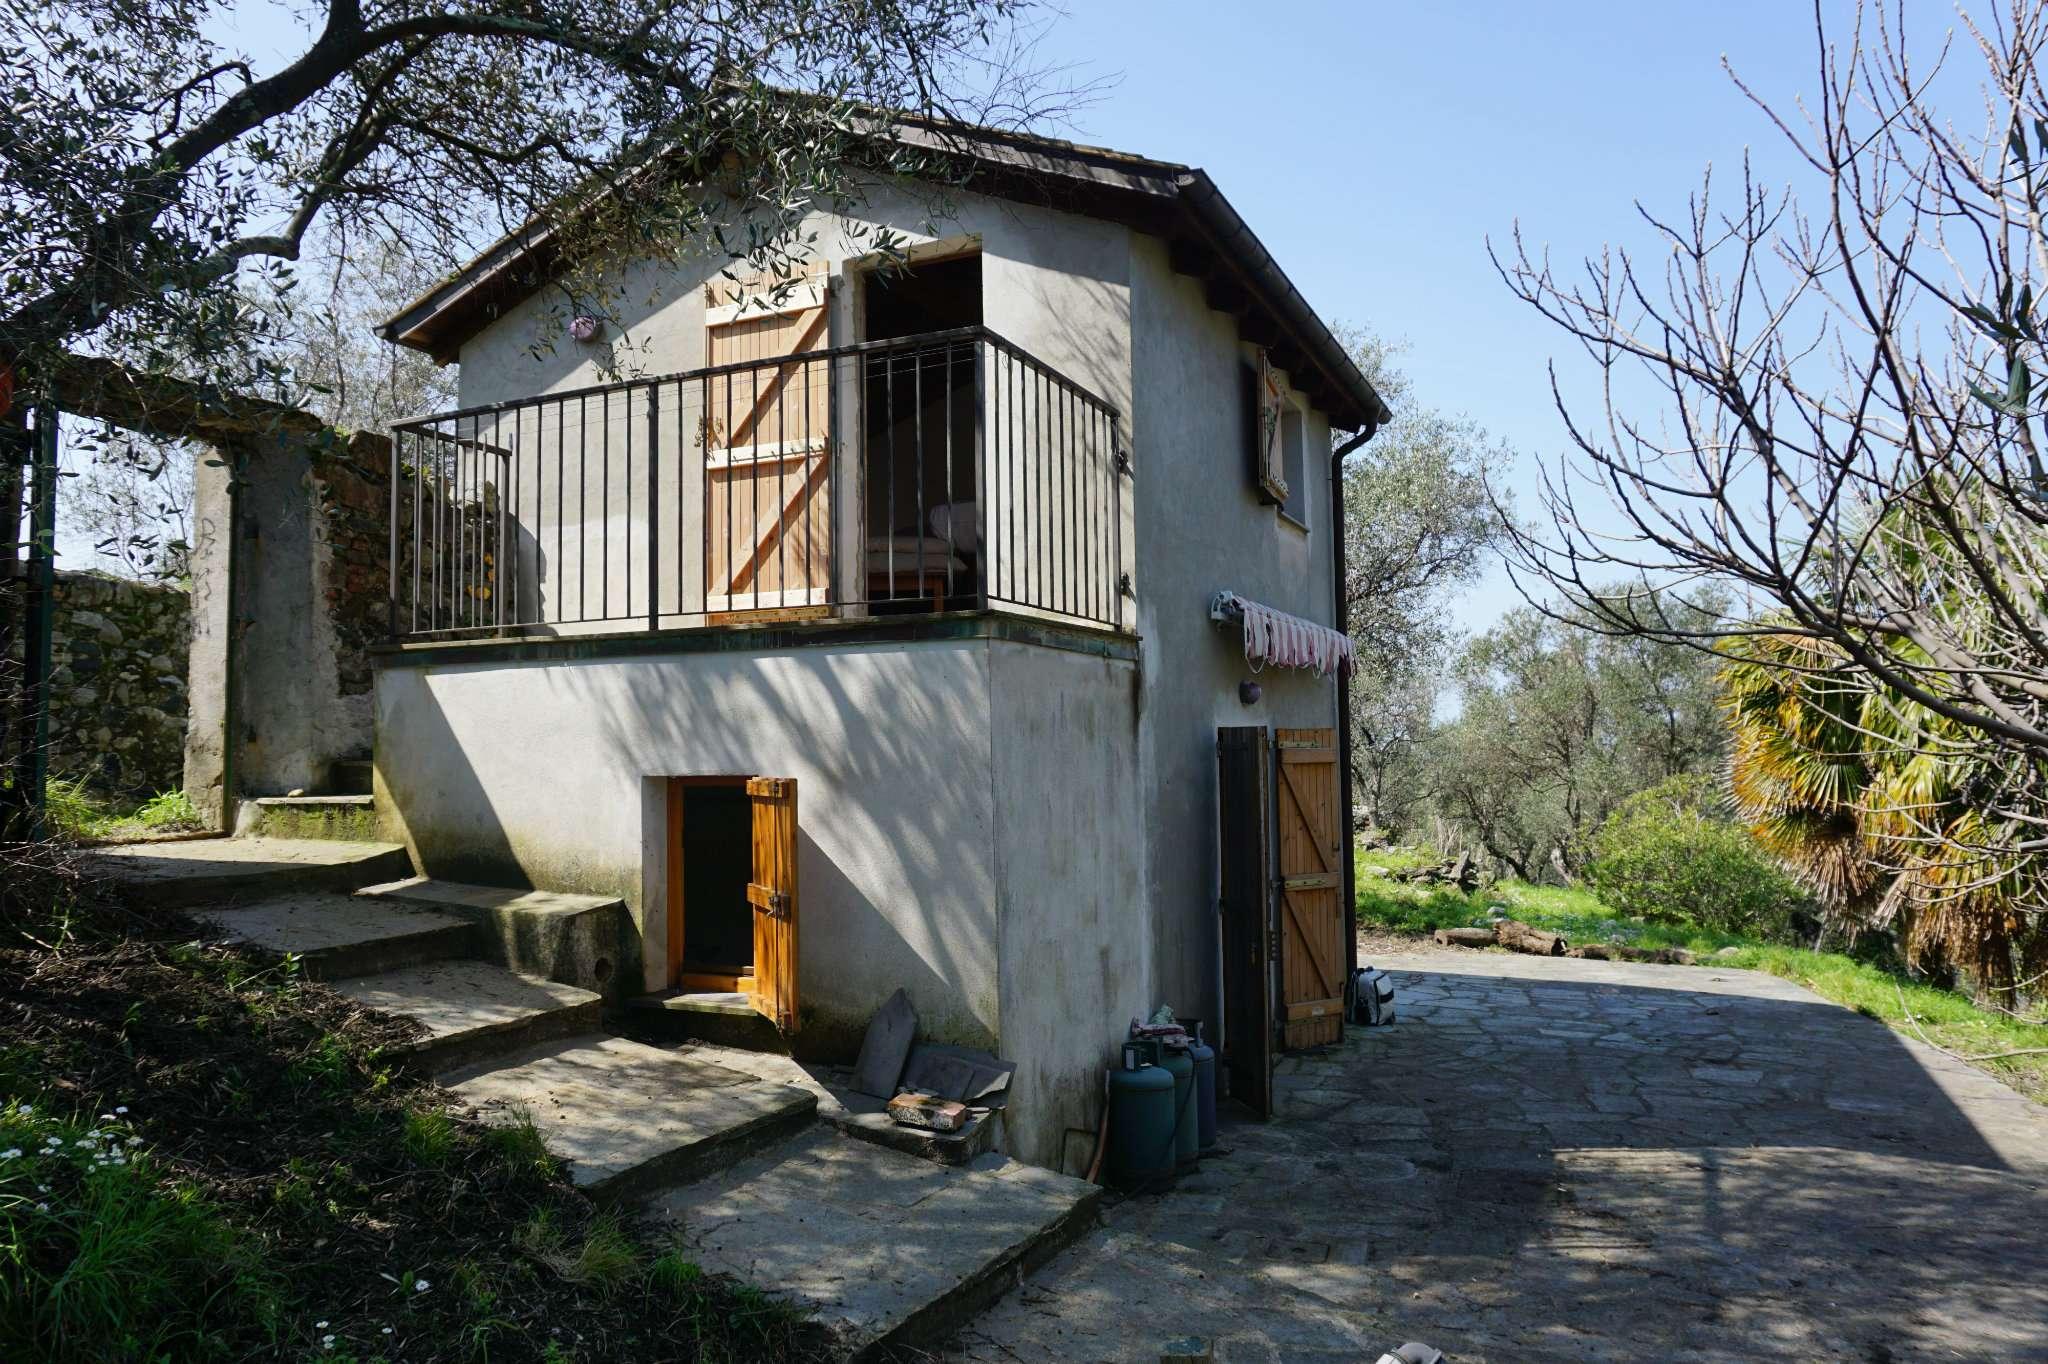 Casa indipendente bilocale in vendita a Levanto (SP)